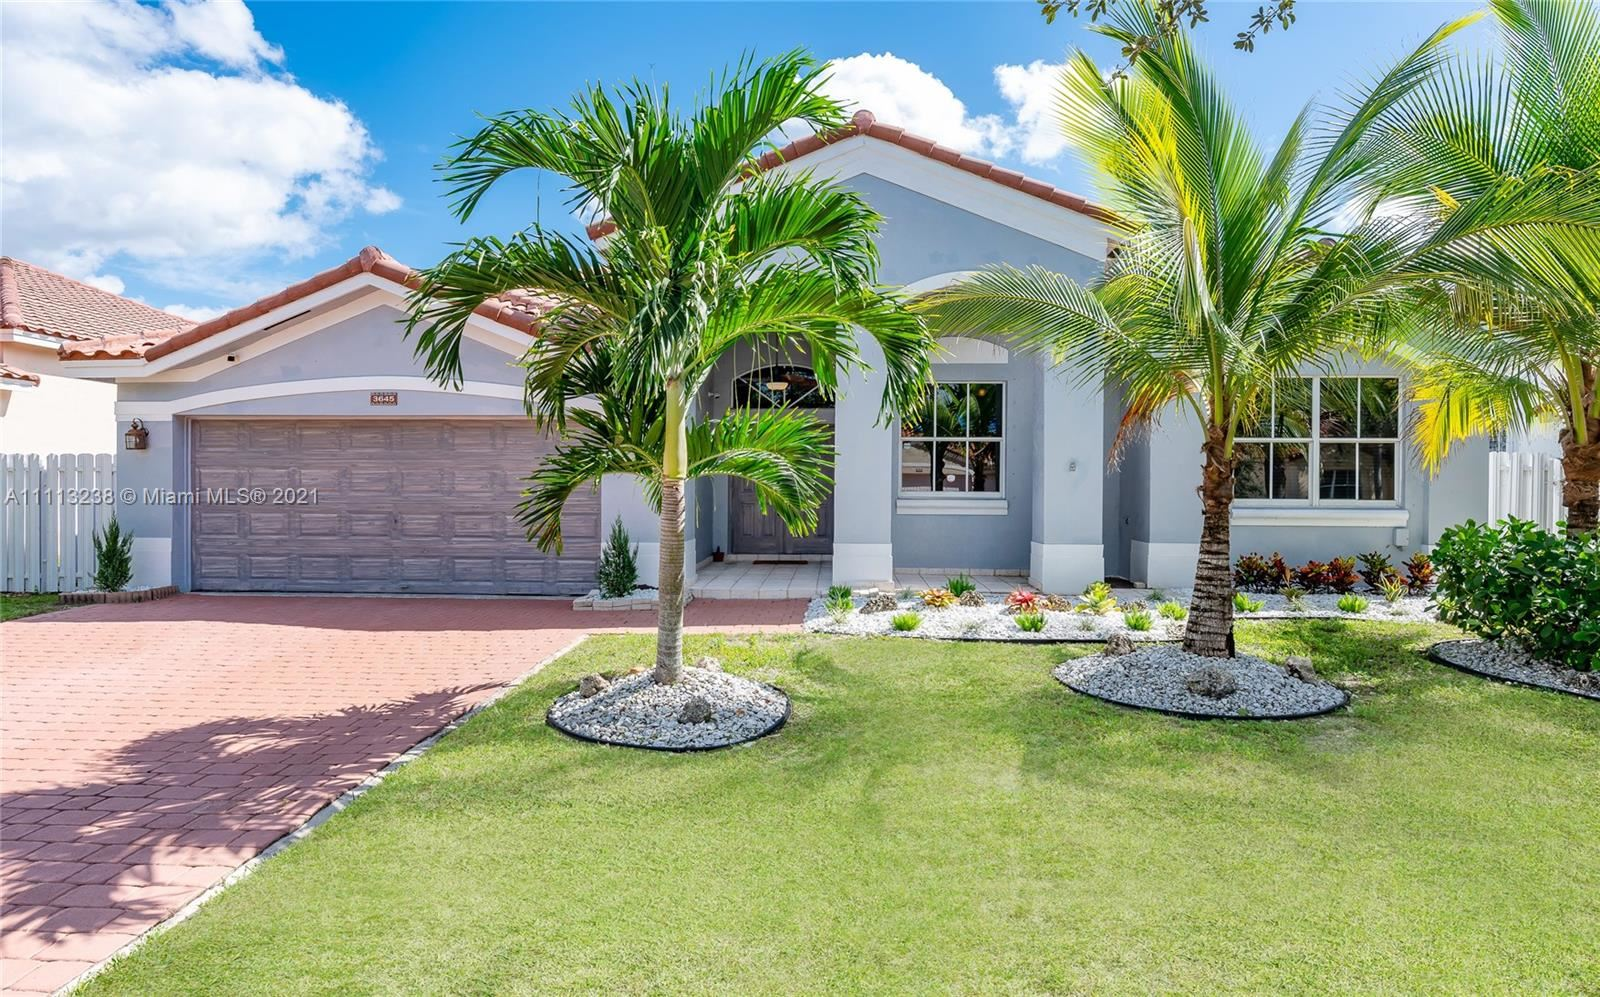 Photo of 3645 SW 162nd Ave, Miramar, FL 33027 (MLS # A11113238)